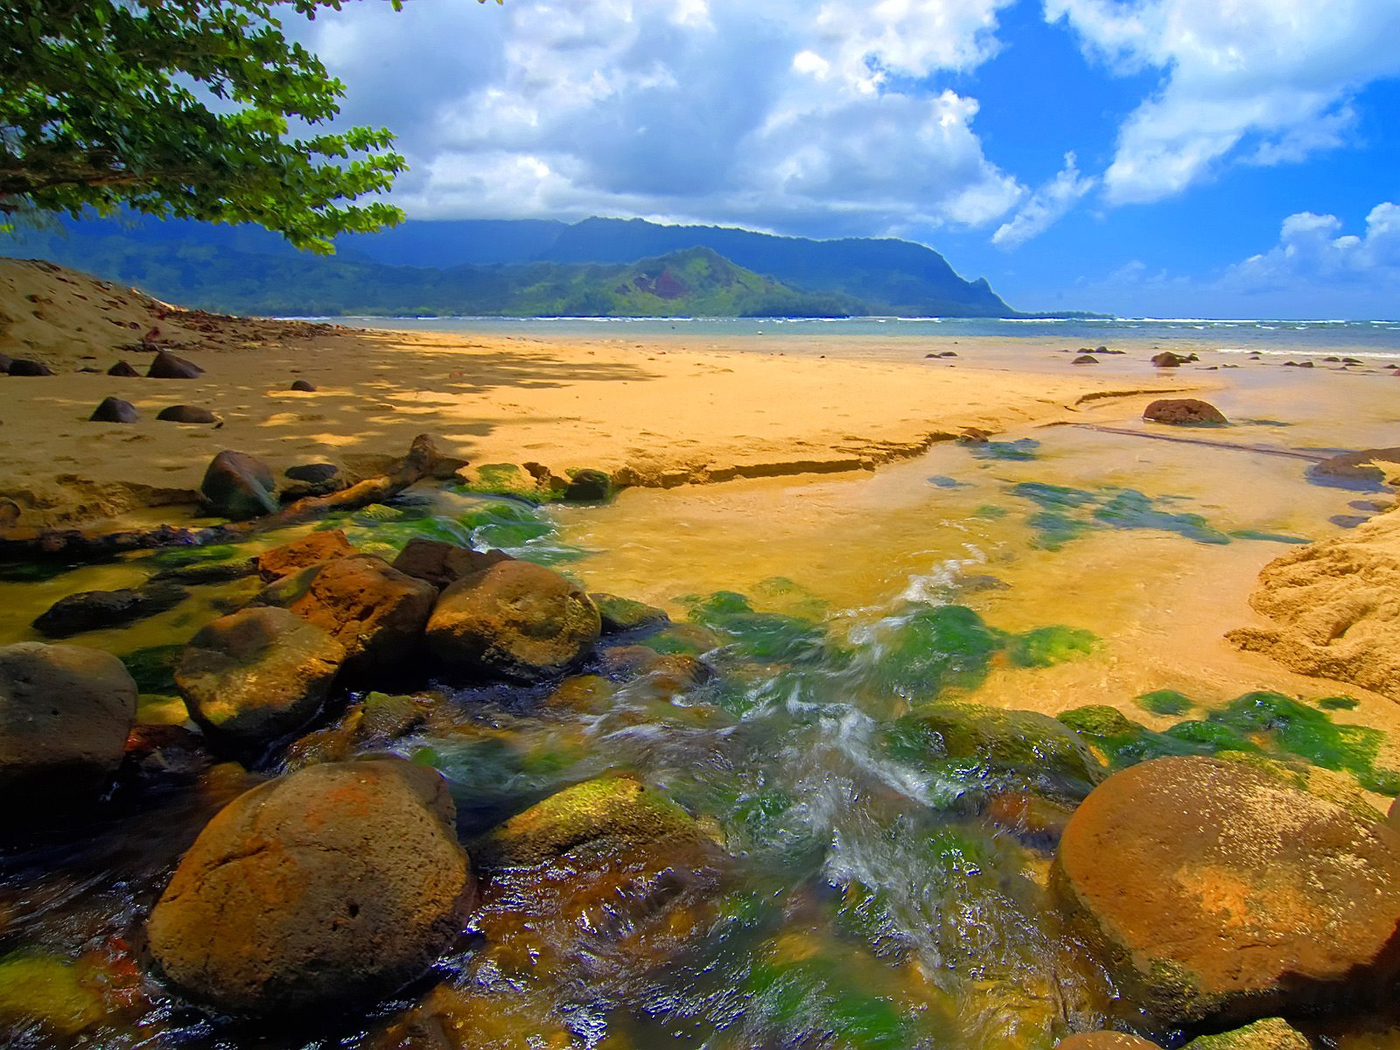 Beautiful Wallpaper Minecraft Beach - bali-hai-stream-kauai-hawaii-beach-wallpaper-1400x1050-222  Snapshot_651046.jpg